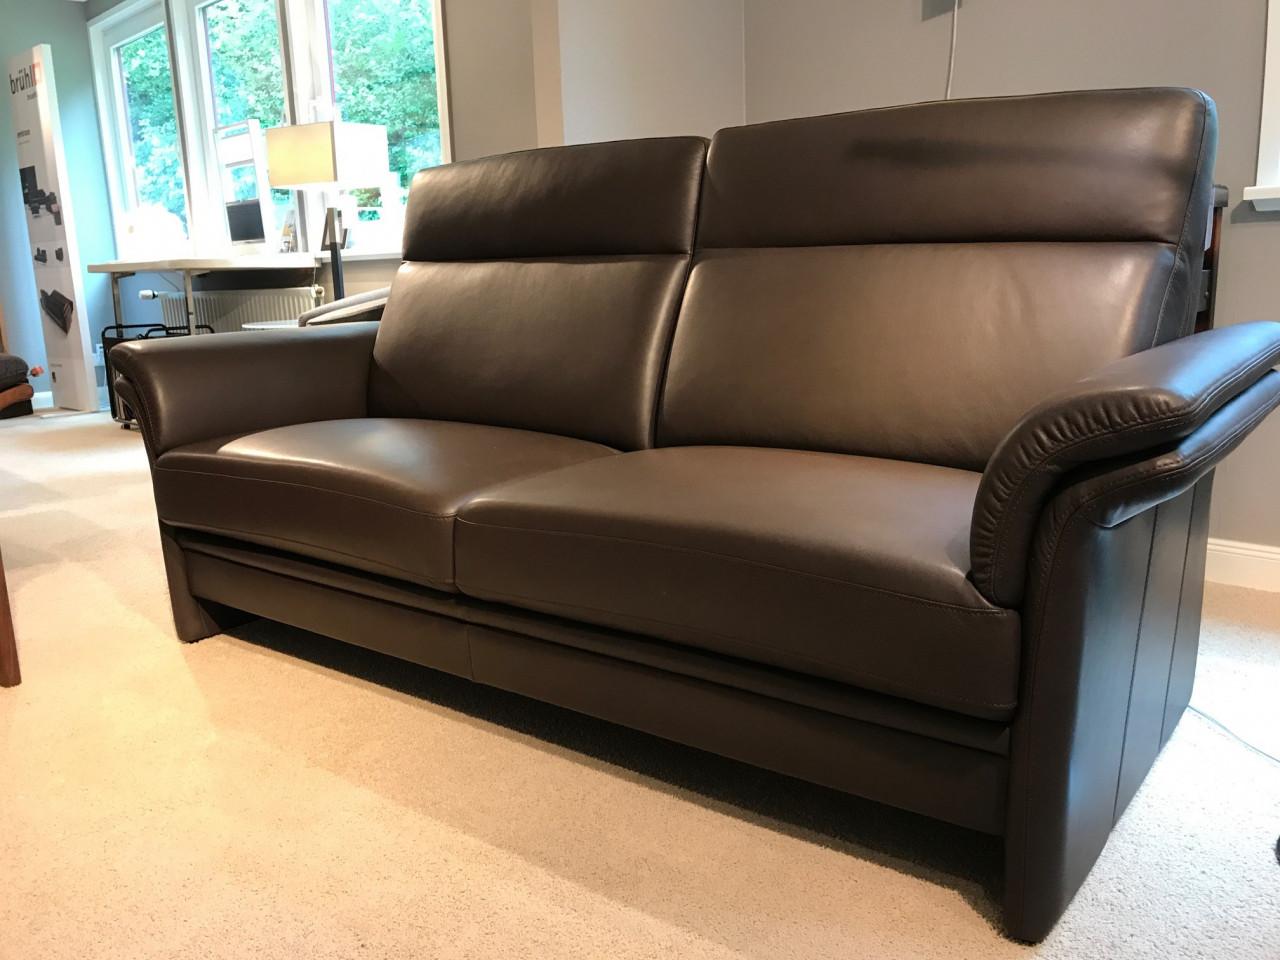 wemafa sofa 690 designerm bel buchholz. Black Bedroom Furniture Sets. Home Design Ideas